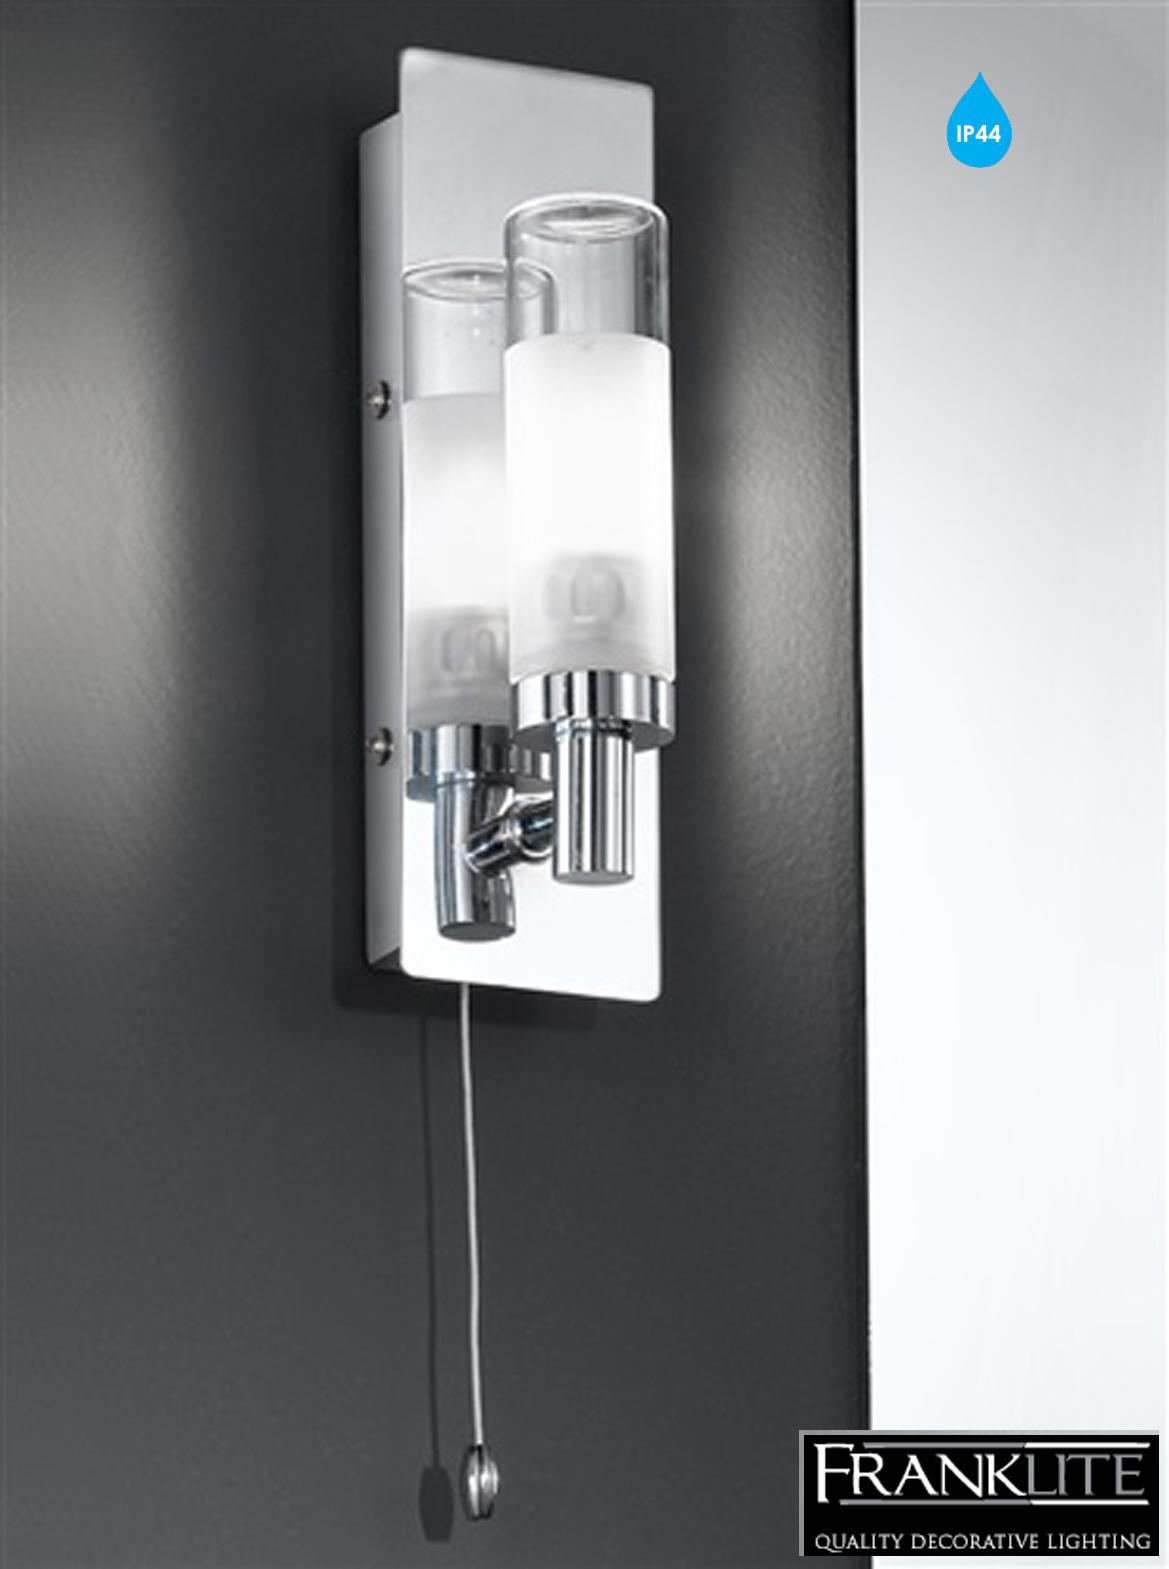 Bathroom Wall Lamp: Franklite Bathroom Single Wall Light, Glass & Chrome